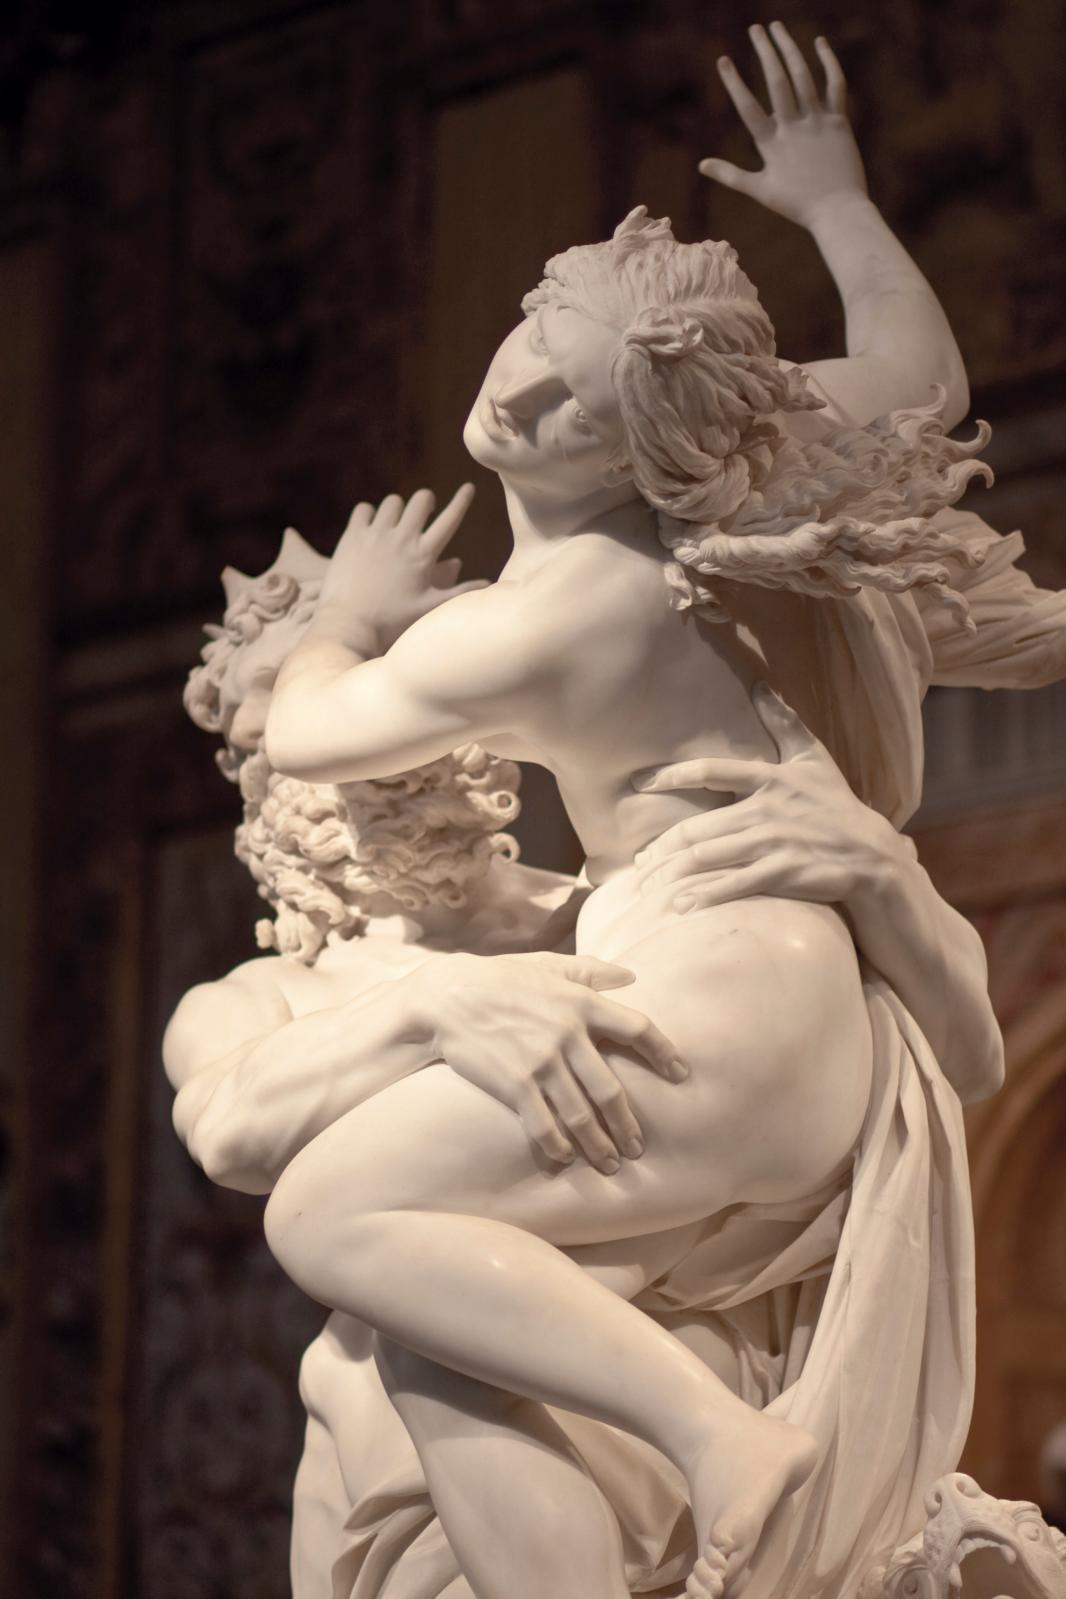 "Gian Lorenzo Bernini (1598-1680), ""The Rape of Proserpina"", c. 1621-1622, marble, 255 x 109 cm. Rome, Borghese Gallery."